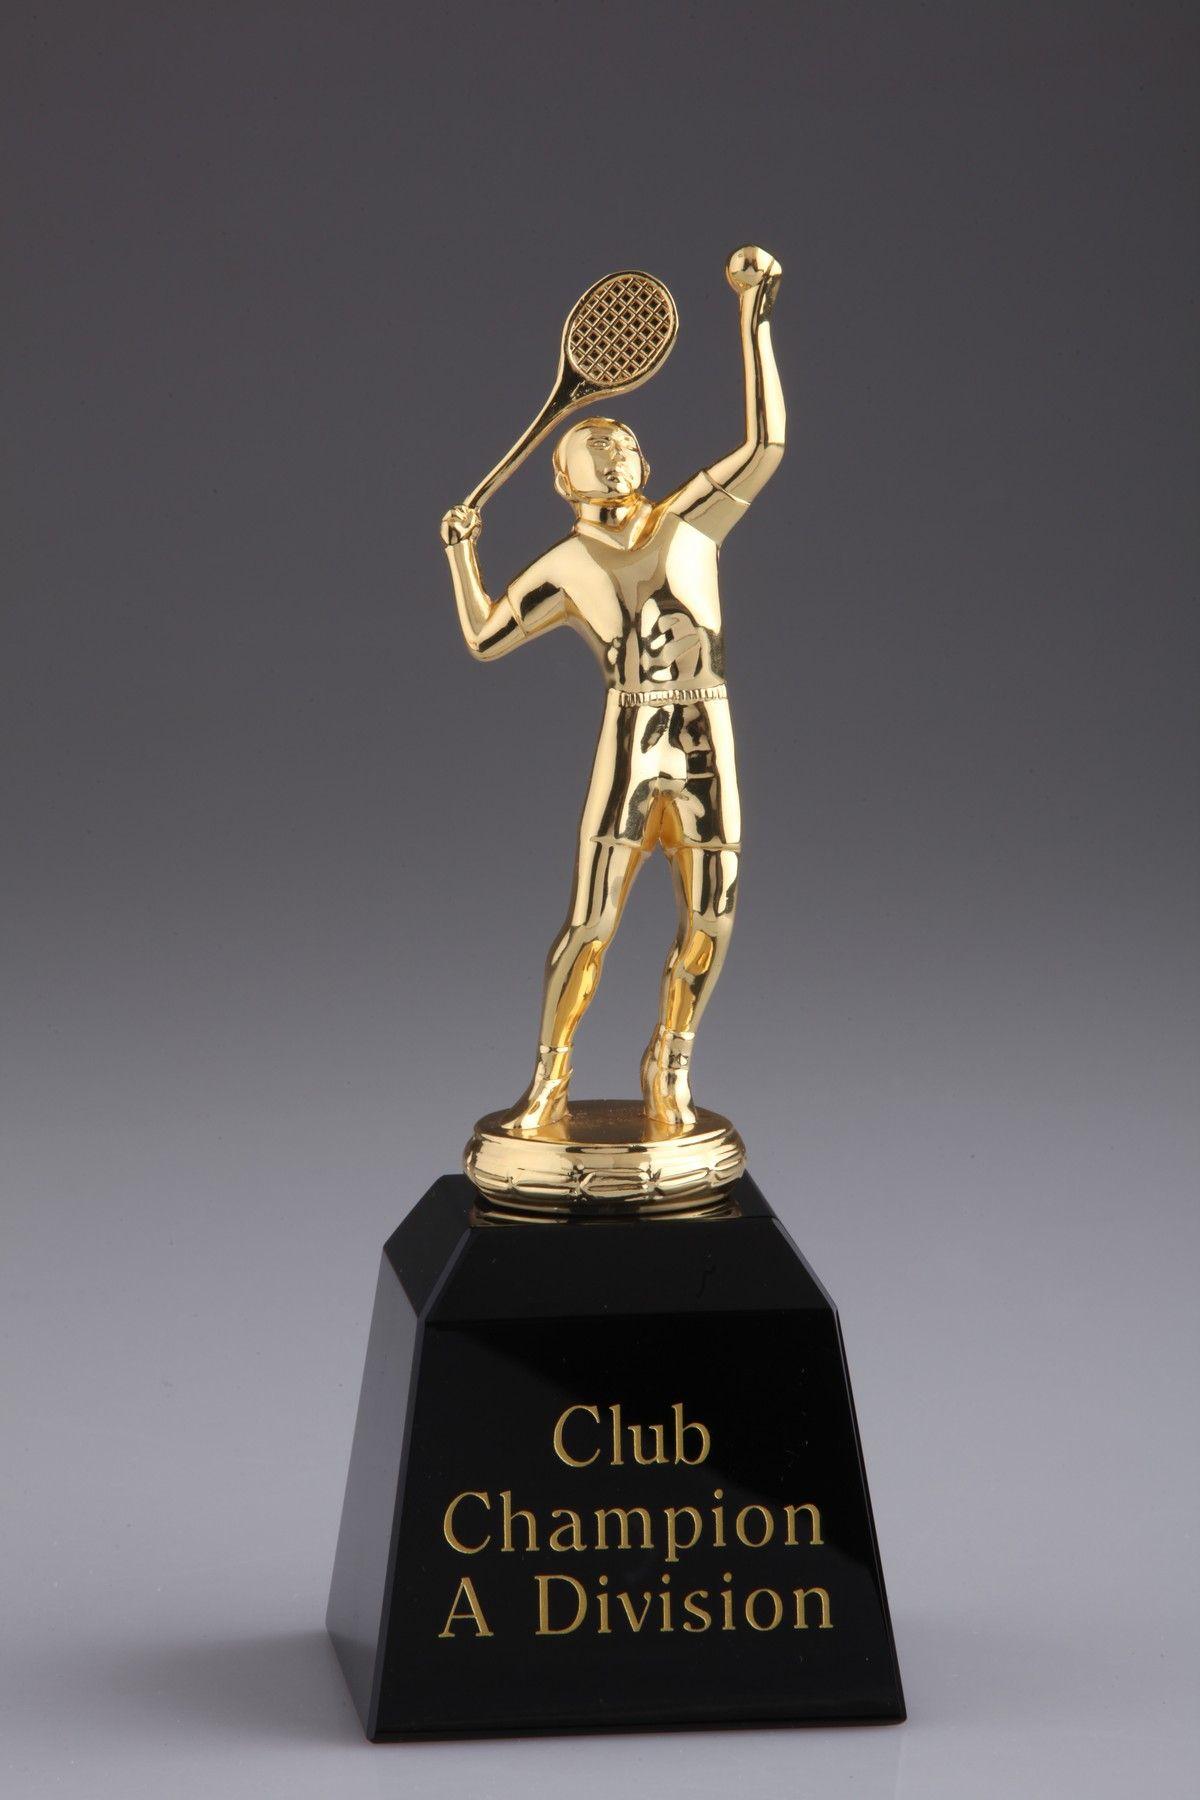 Tennis Crystal Trophy Awards Optic Crystal Sports Awards Trophies Crystal Awards Crystals Tennis Trophy